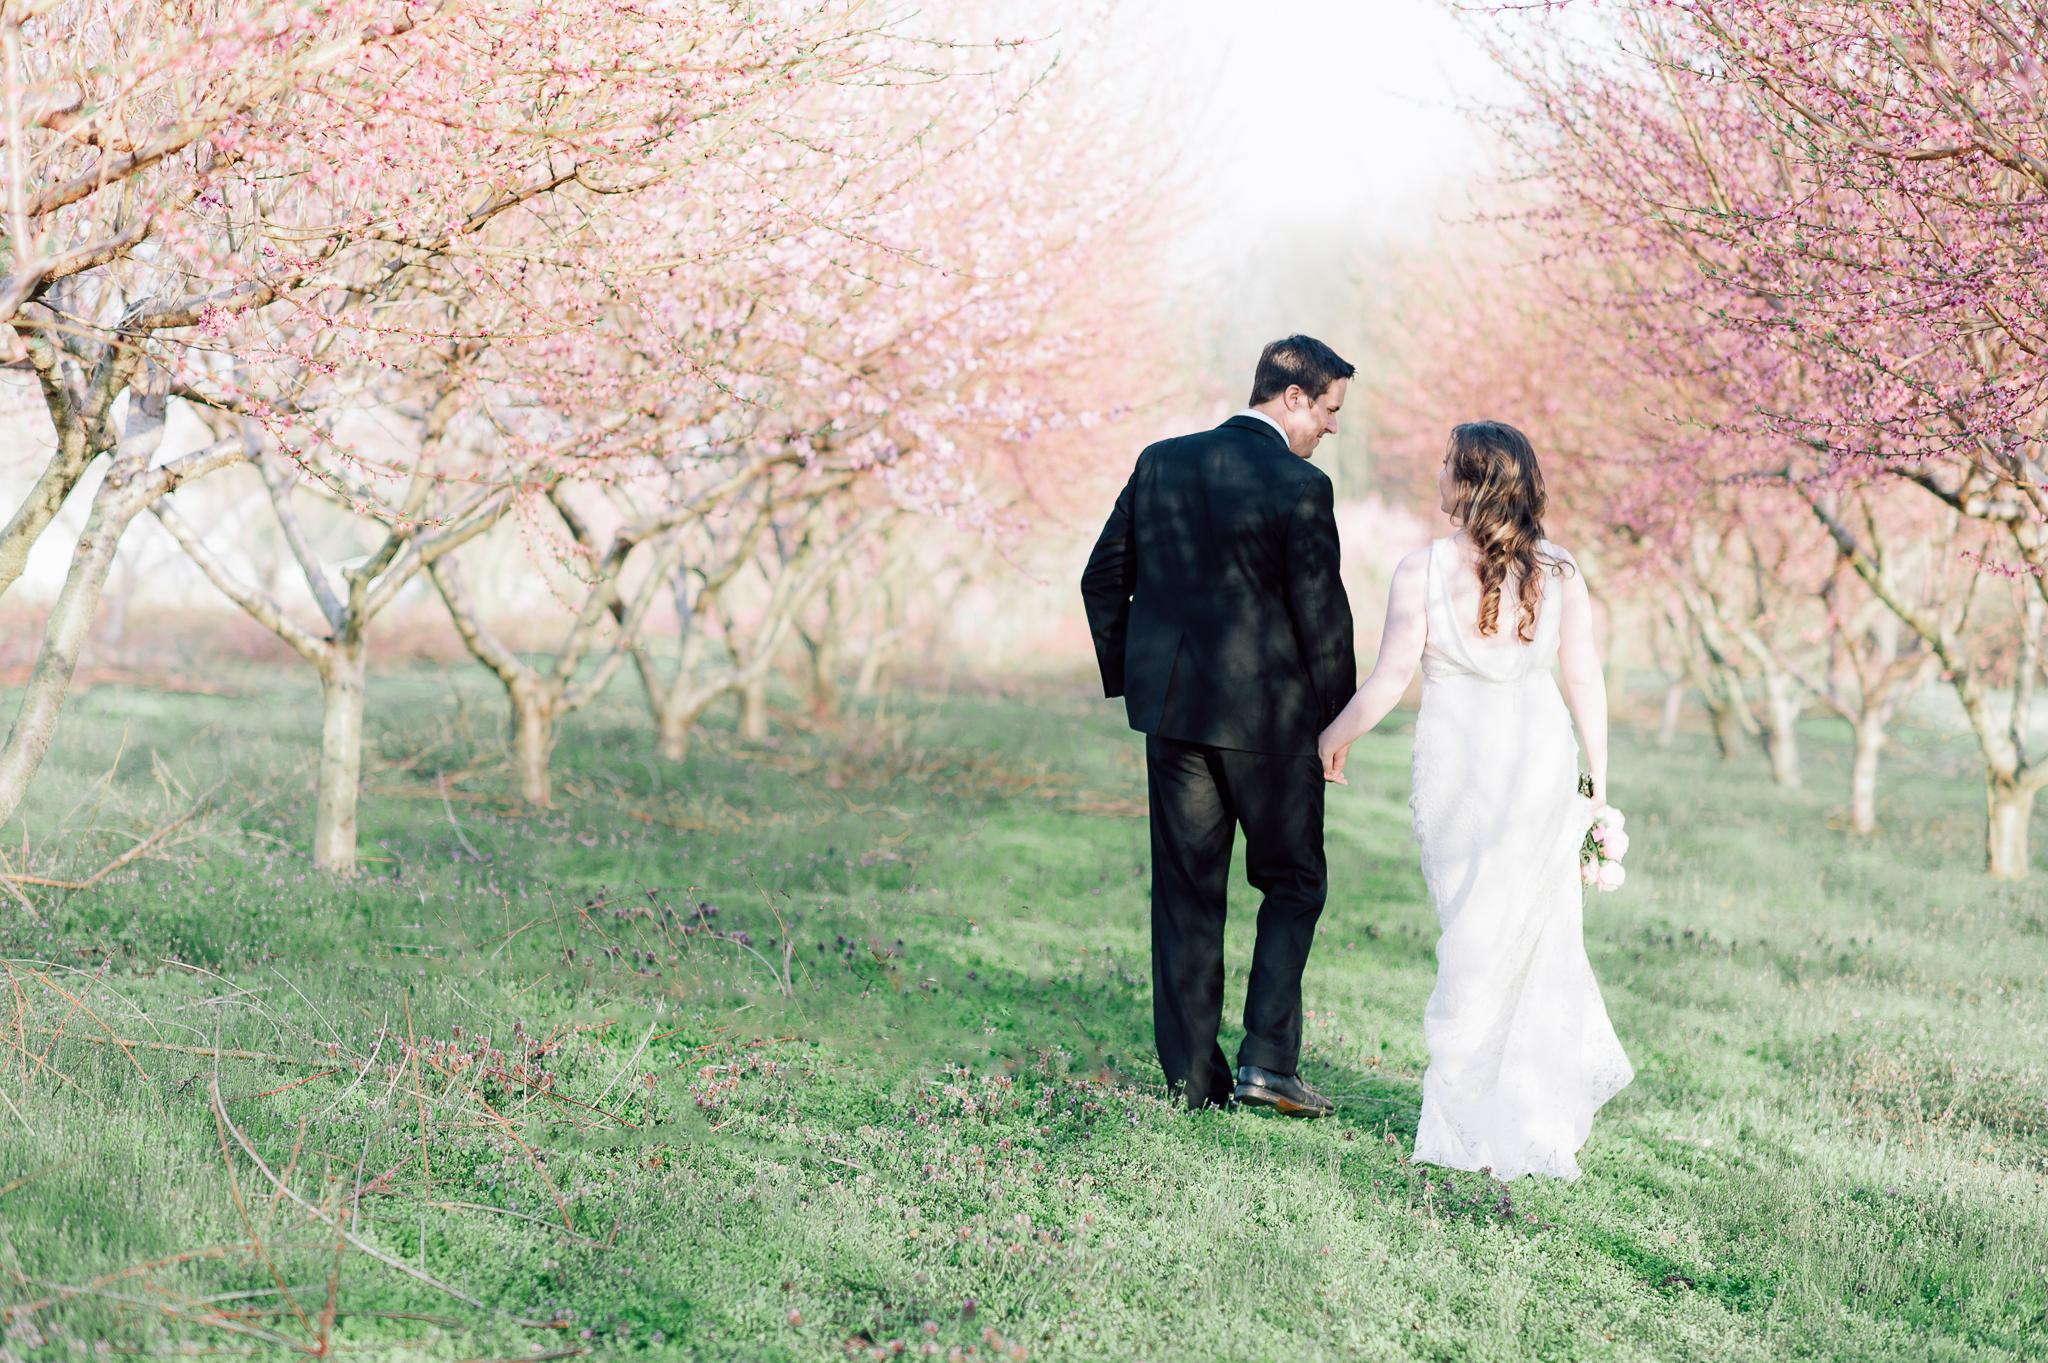 springwedding_cherryblossoms_virginiaphotographer_youseephotography_styledshoot (573).jpg